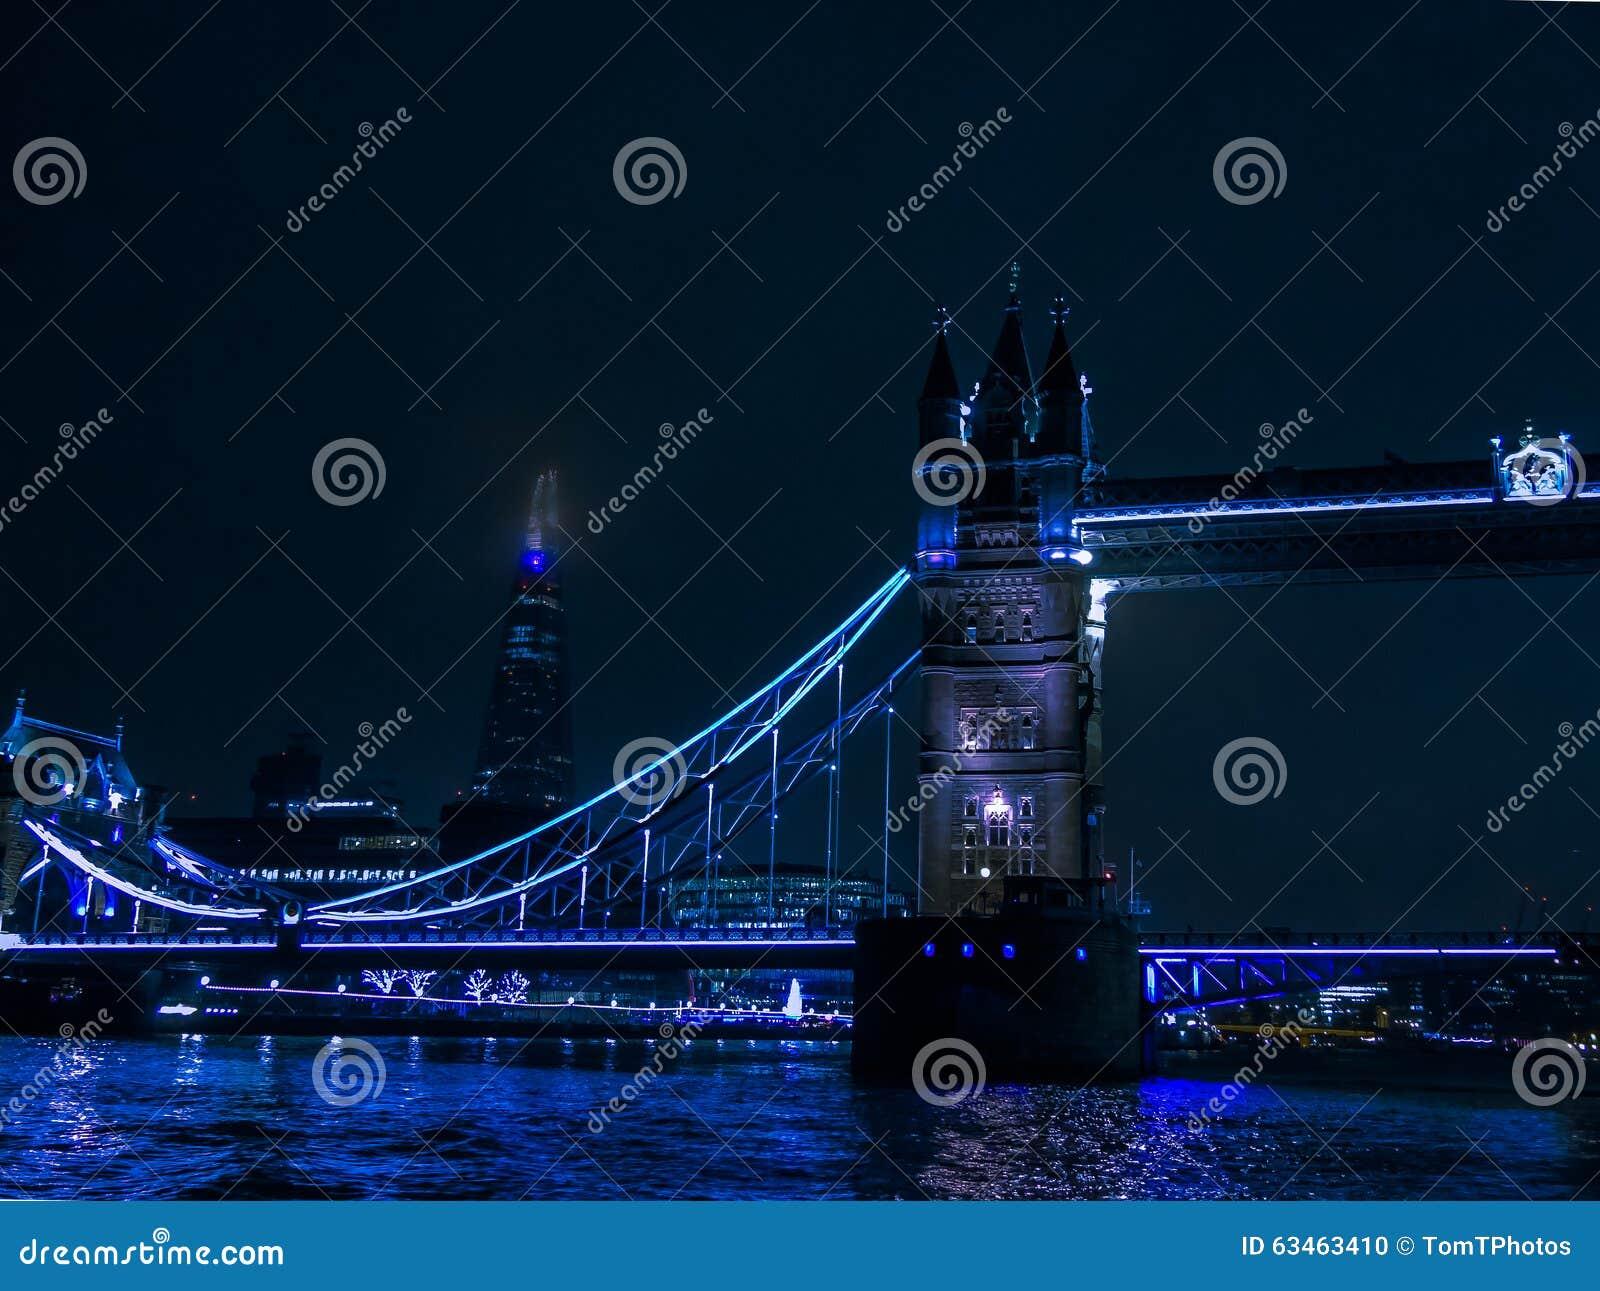 bridge gb night london - photo #33